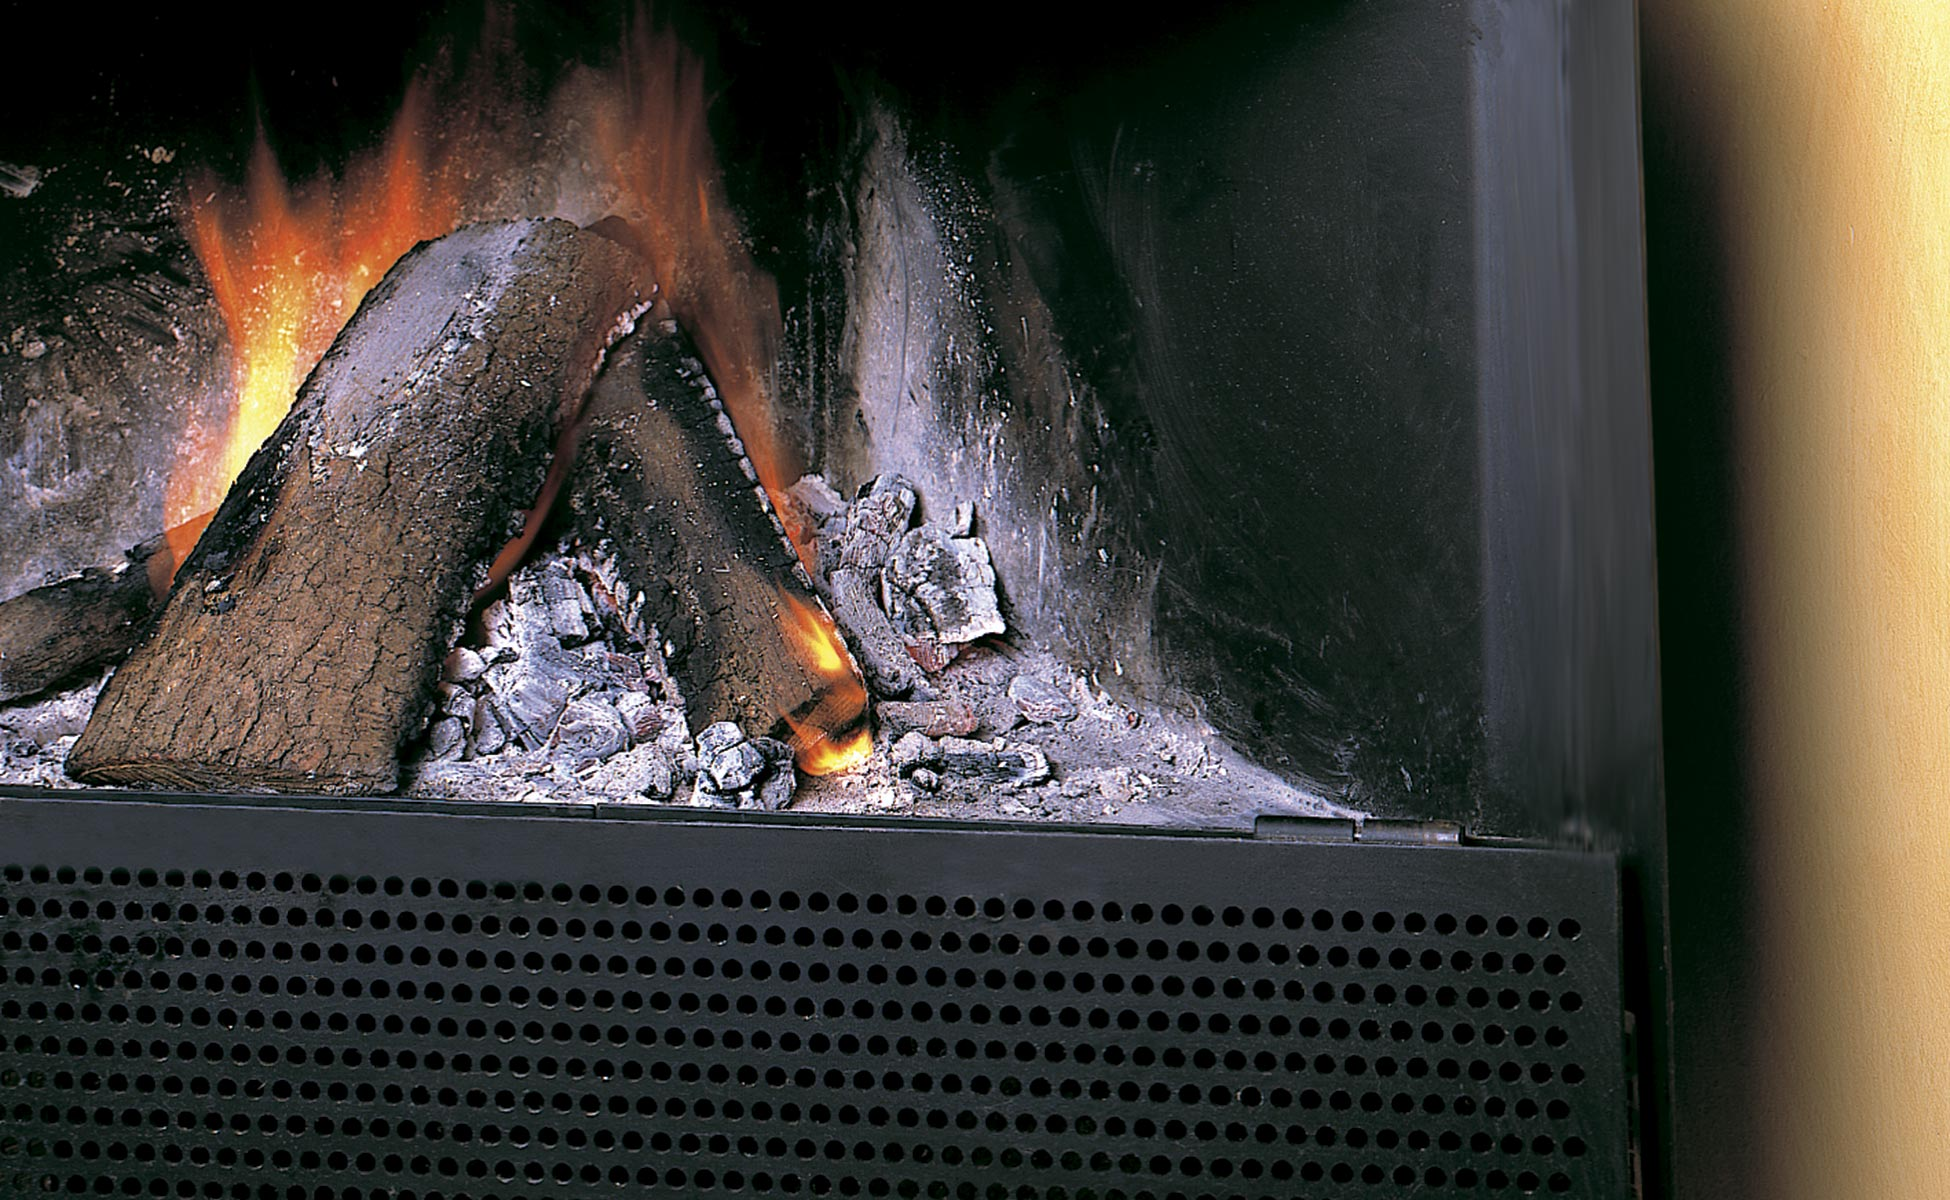 Chimenea MM. Detalle del fuego